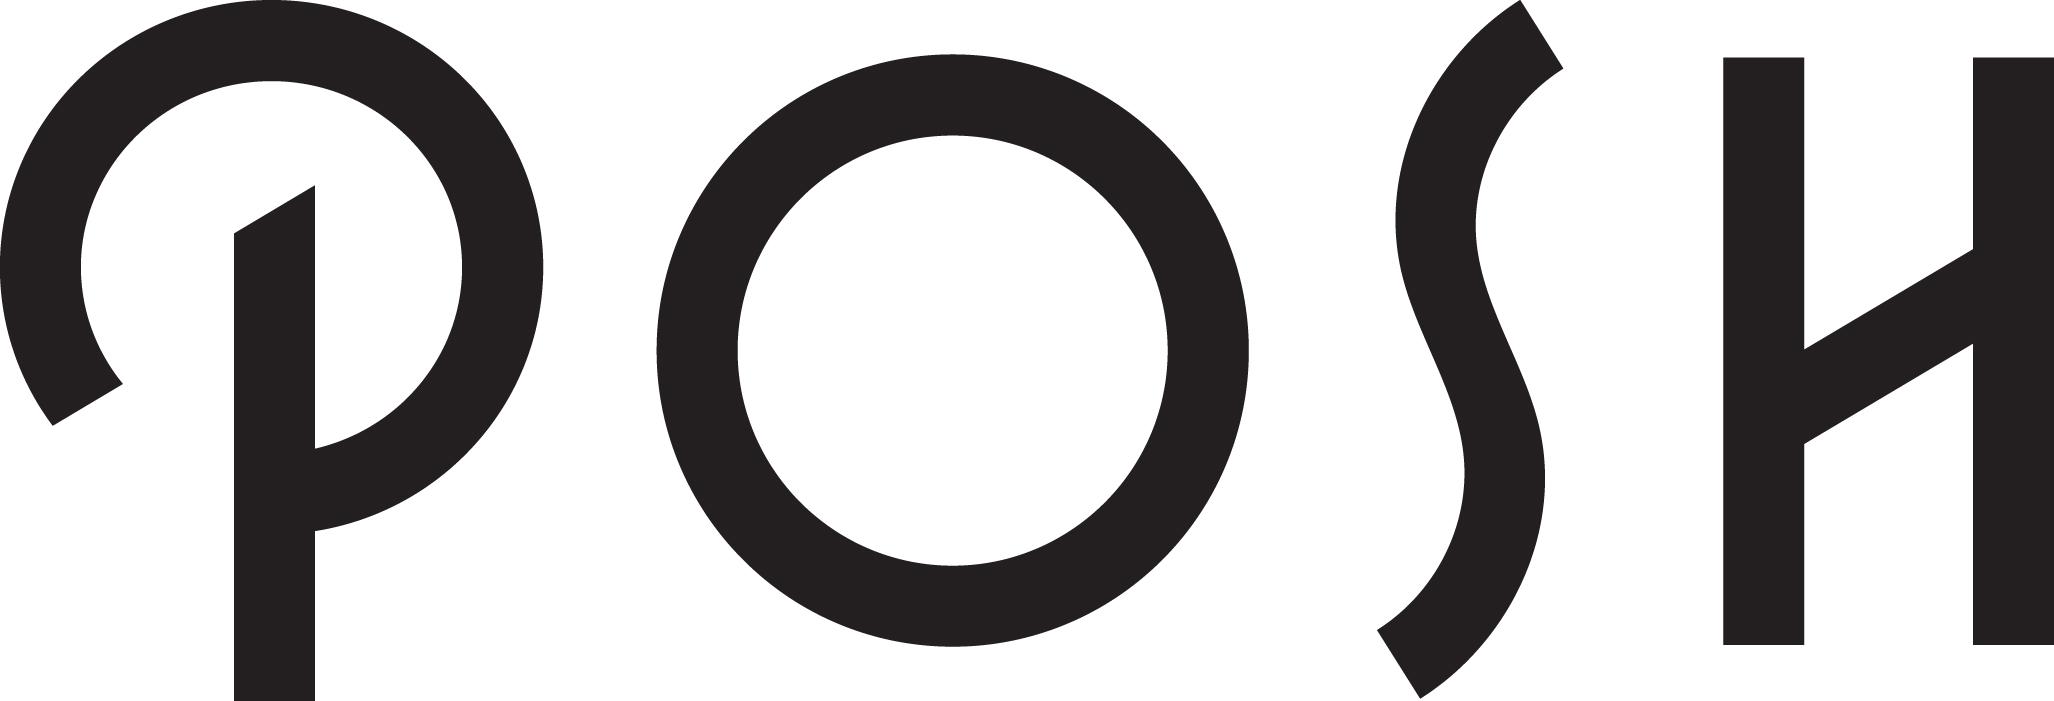 POSH-Logo.jpg